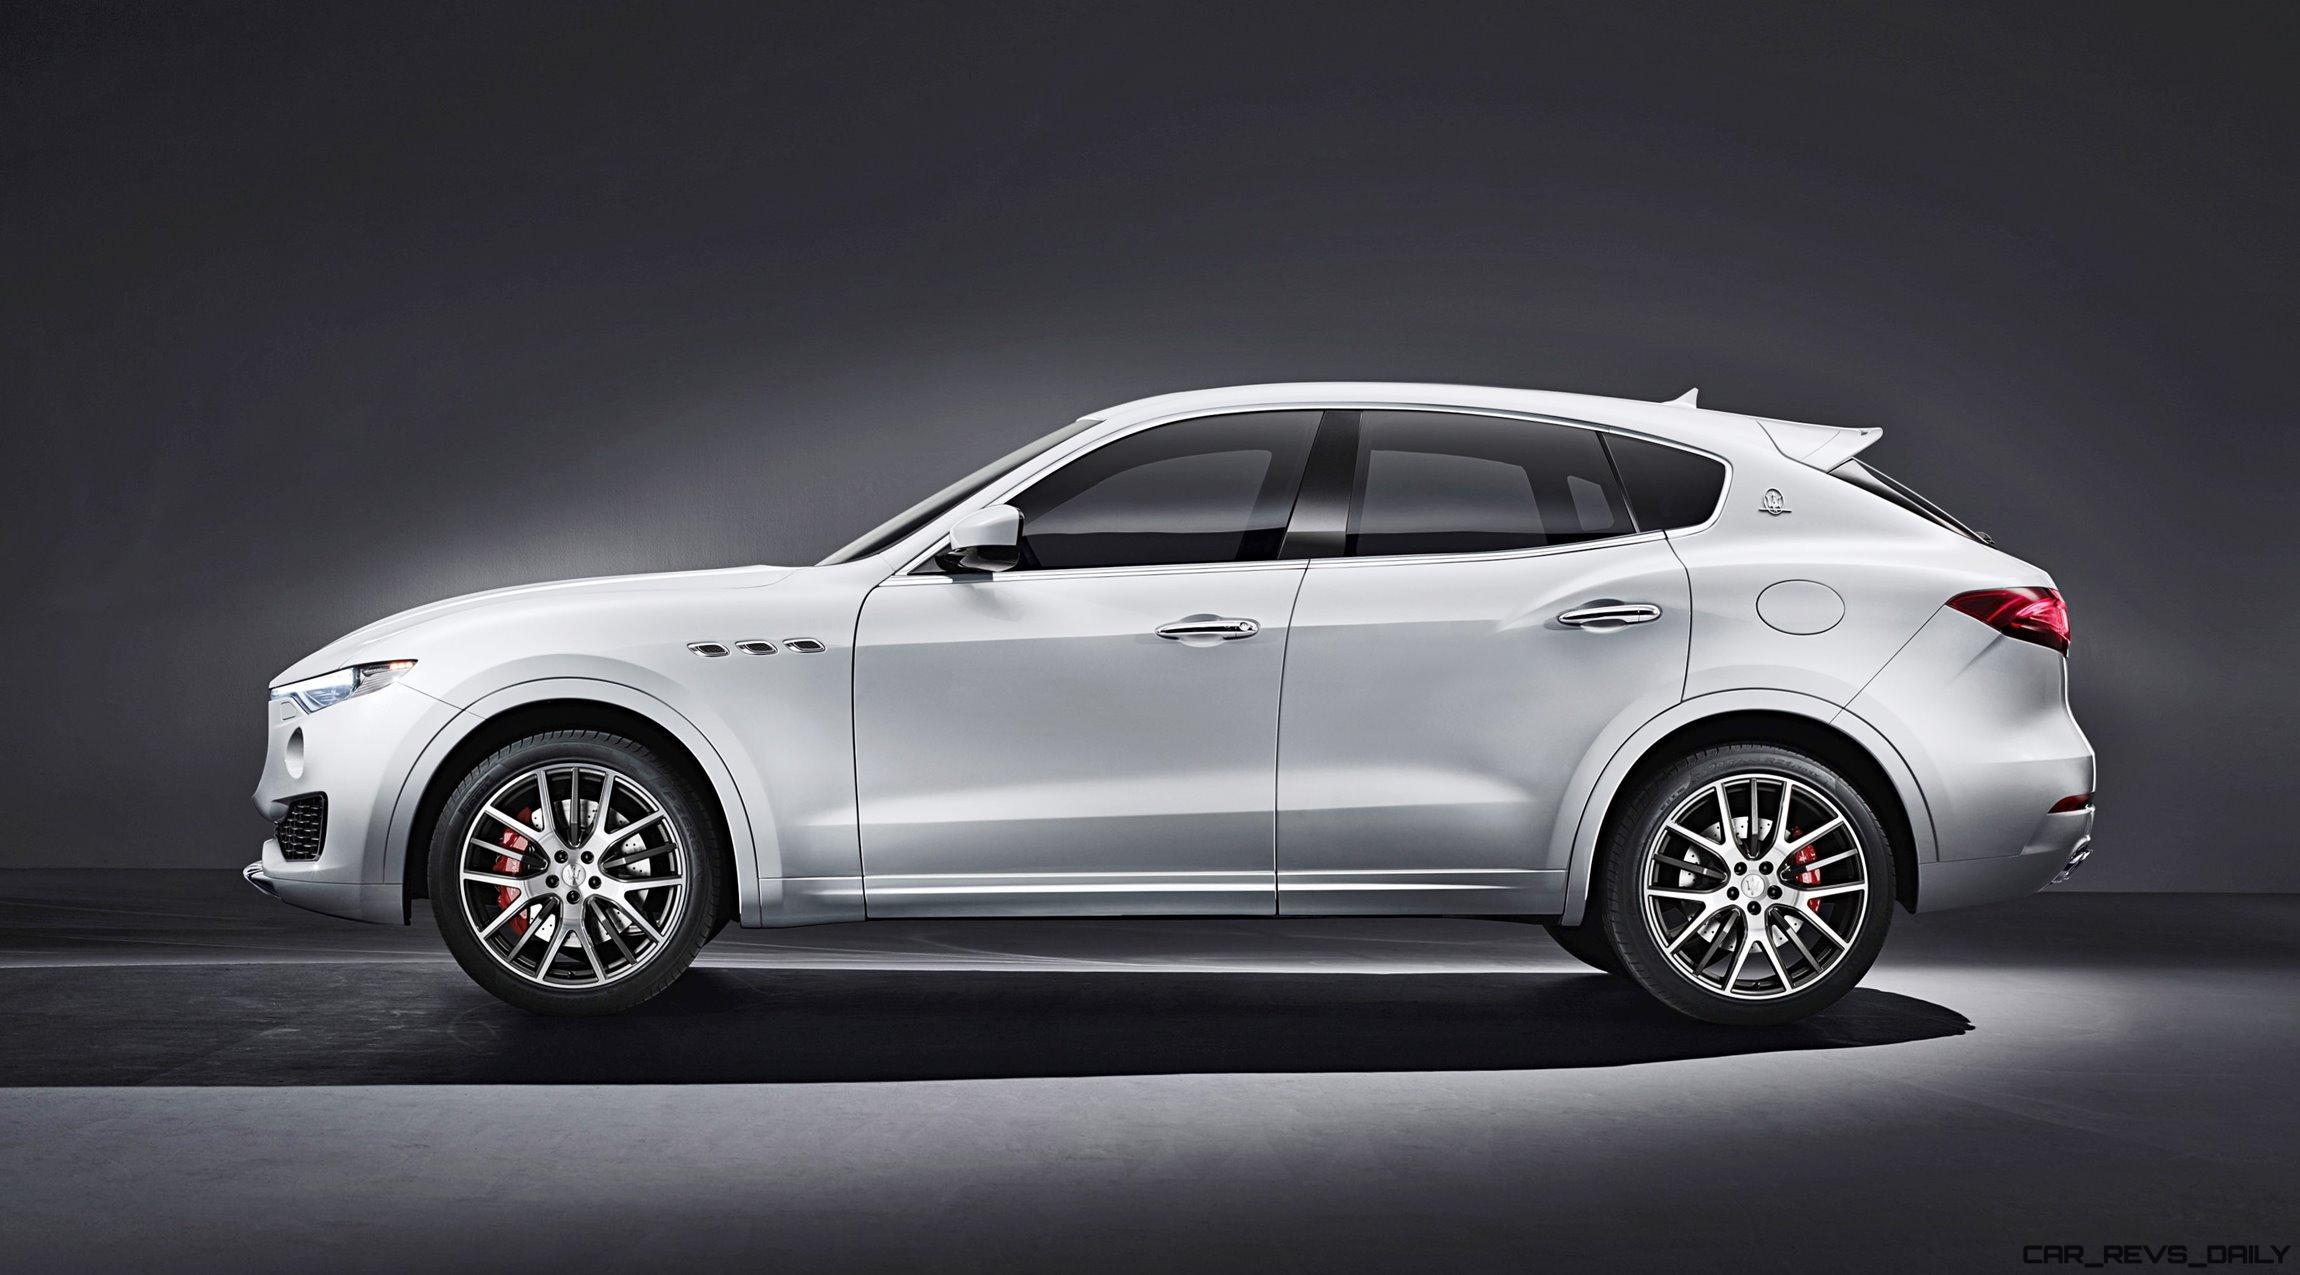 2017 maserati levante new luxury suv 2017 2018 best cars reviews. Black Bedroom Furniture Sets. Home Design Ideas